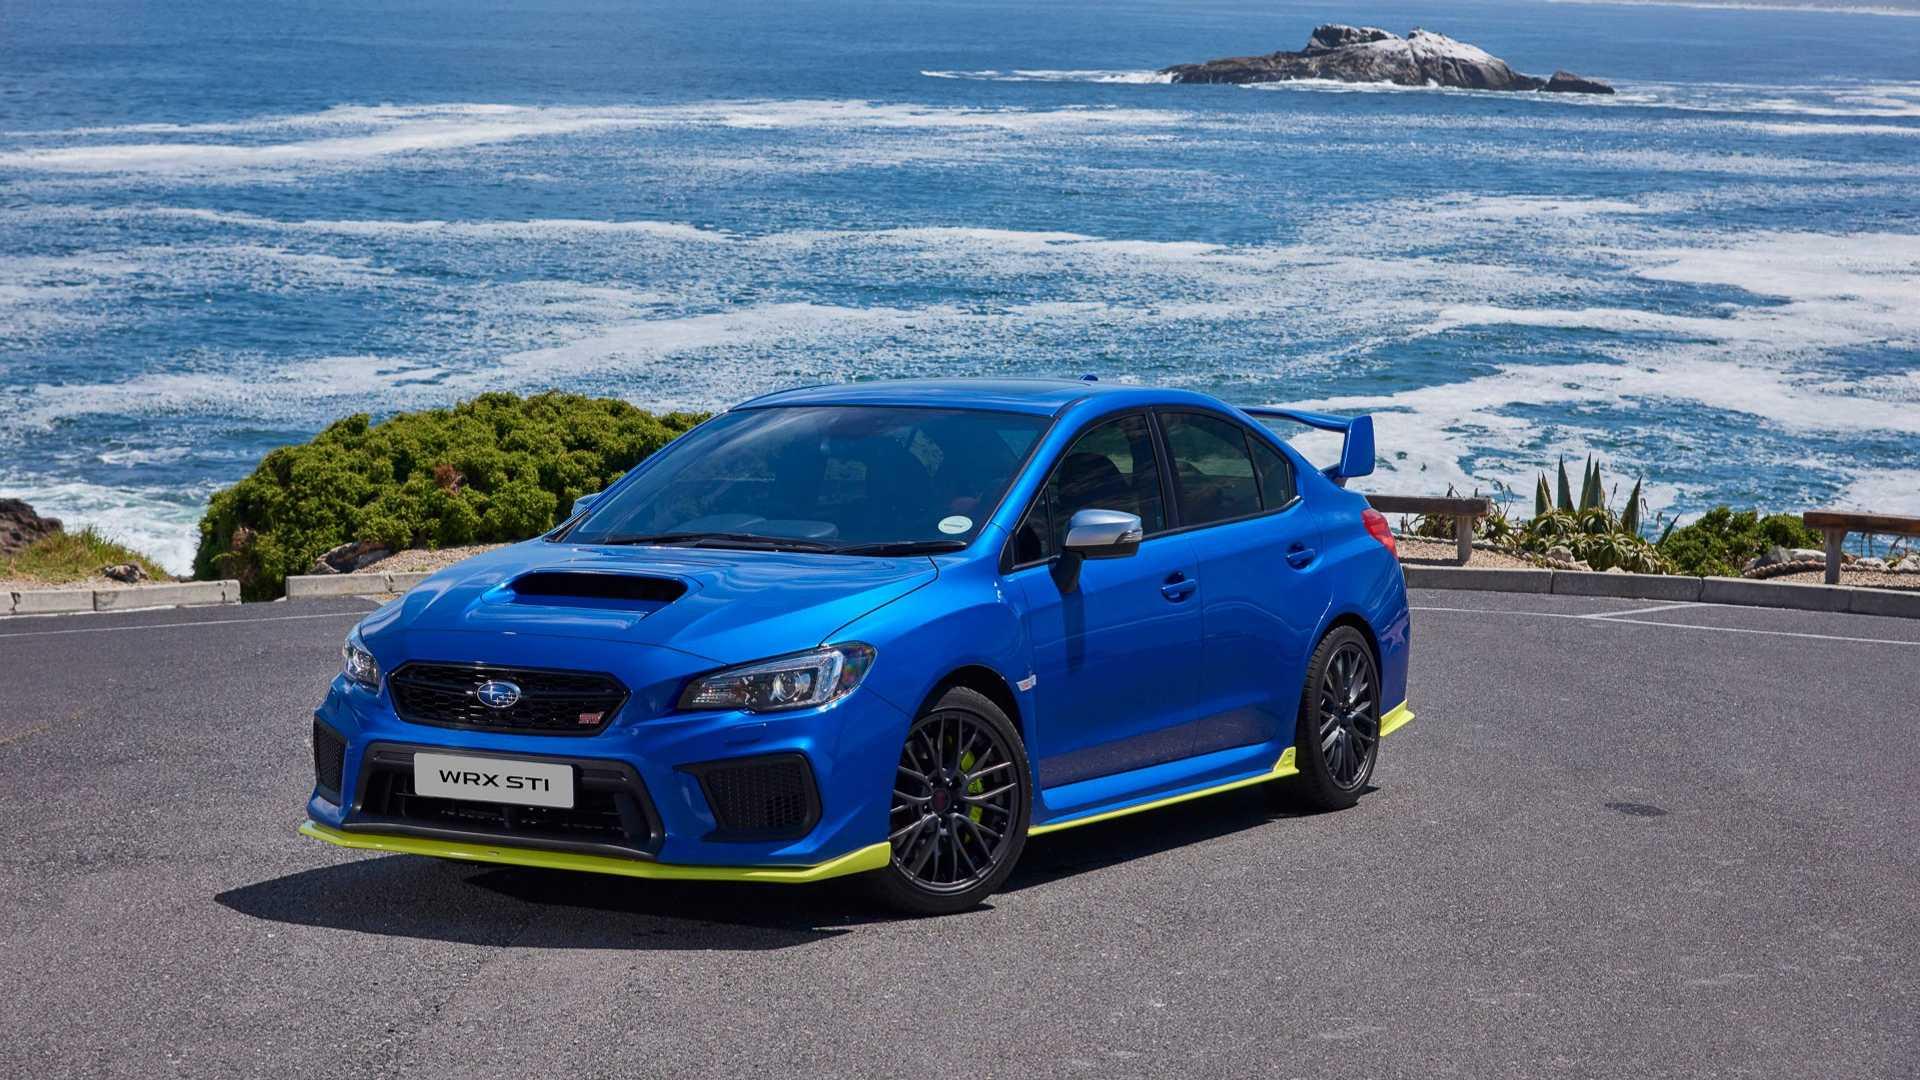 Subaru презентовала самую мощную серийную WRX STI 1